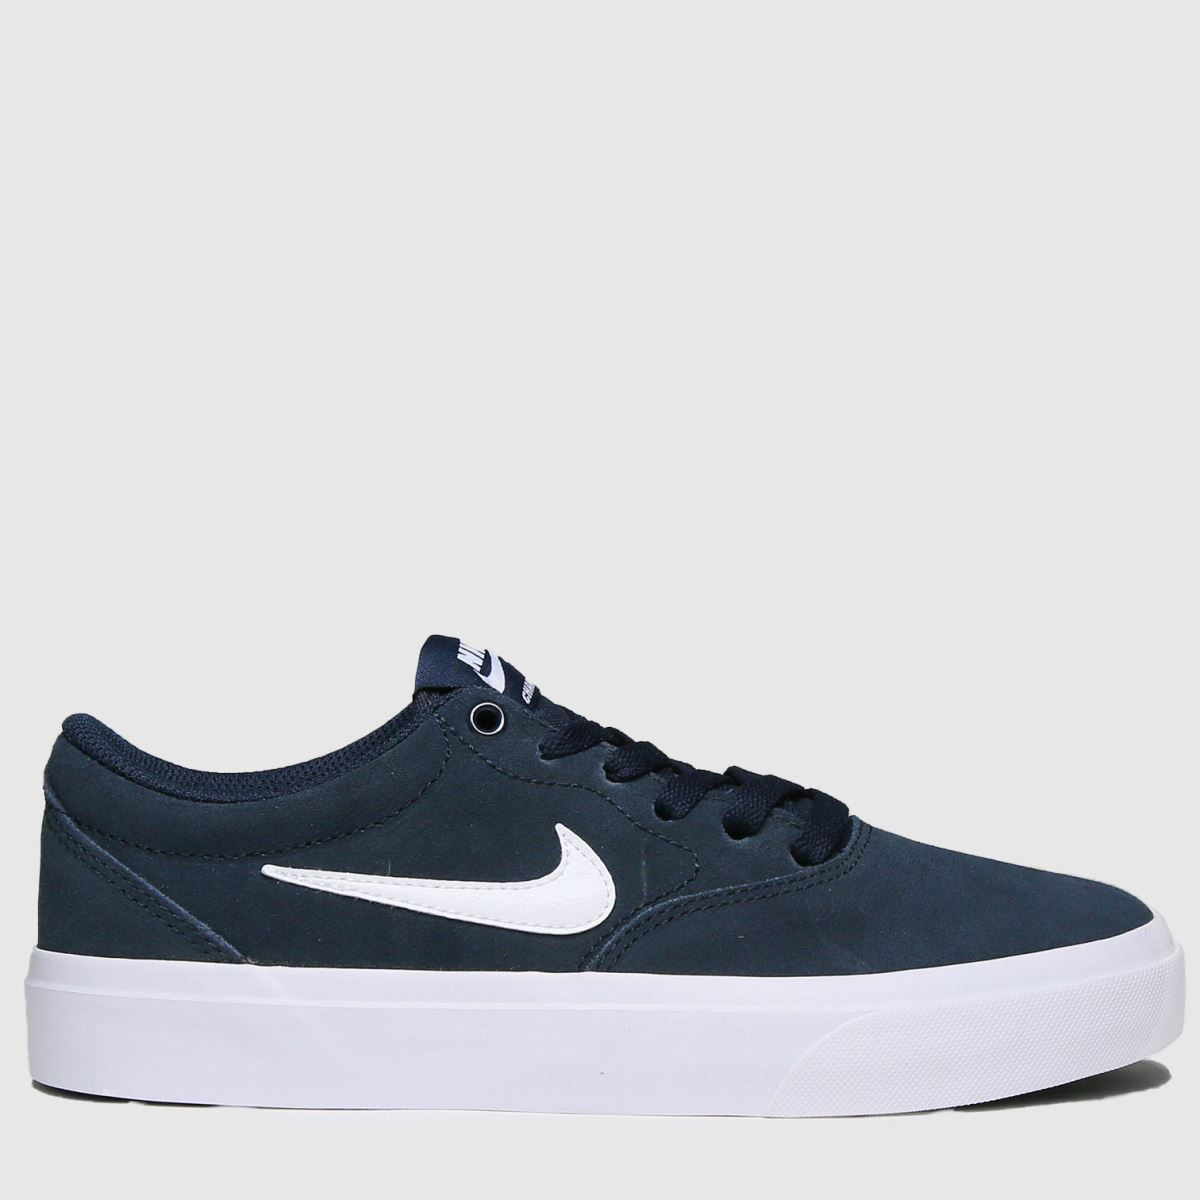 Nike SB Nike SB Navy Charge Trainers Youth